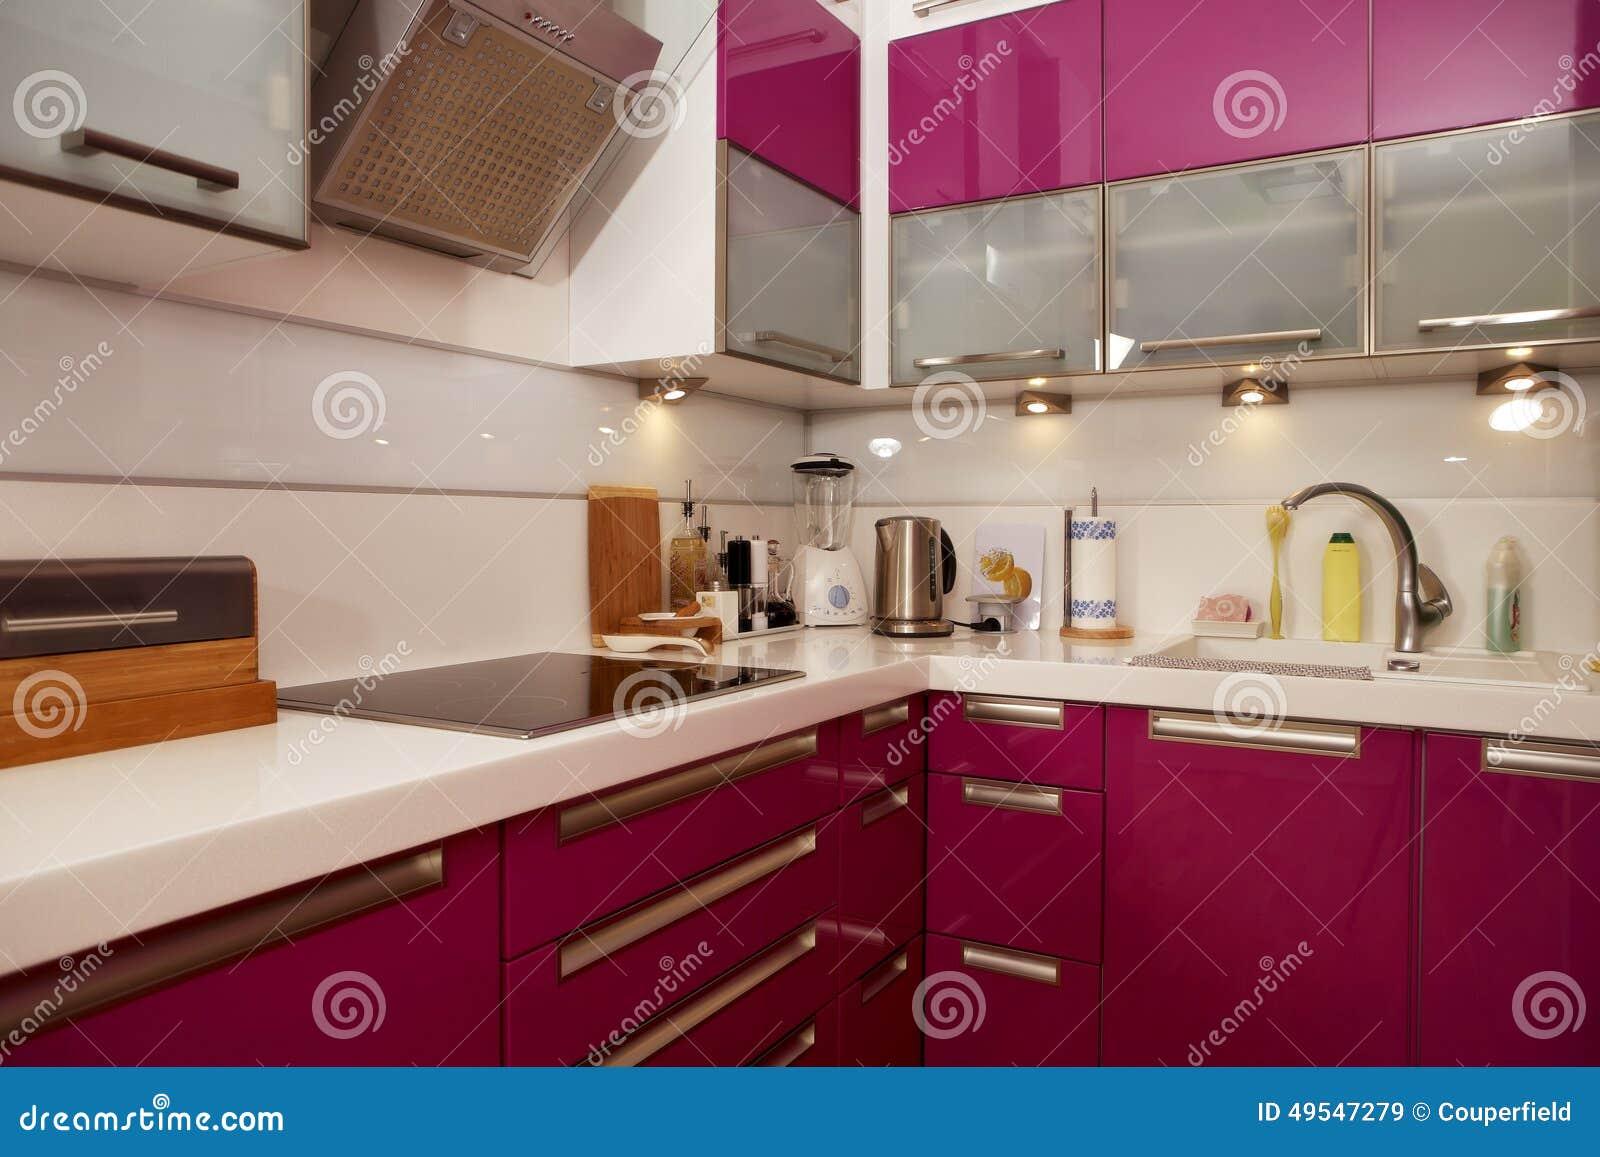 Moderne roze keuken redactionele stock afbeelding afbeelding 49547279 - Afbeelding moderne keuken ...